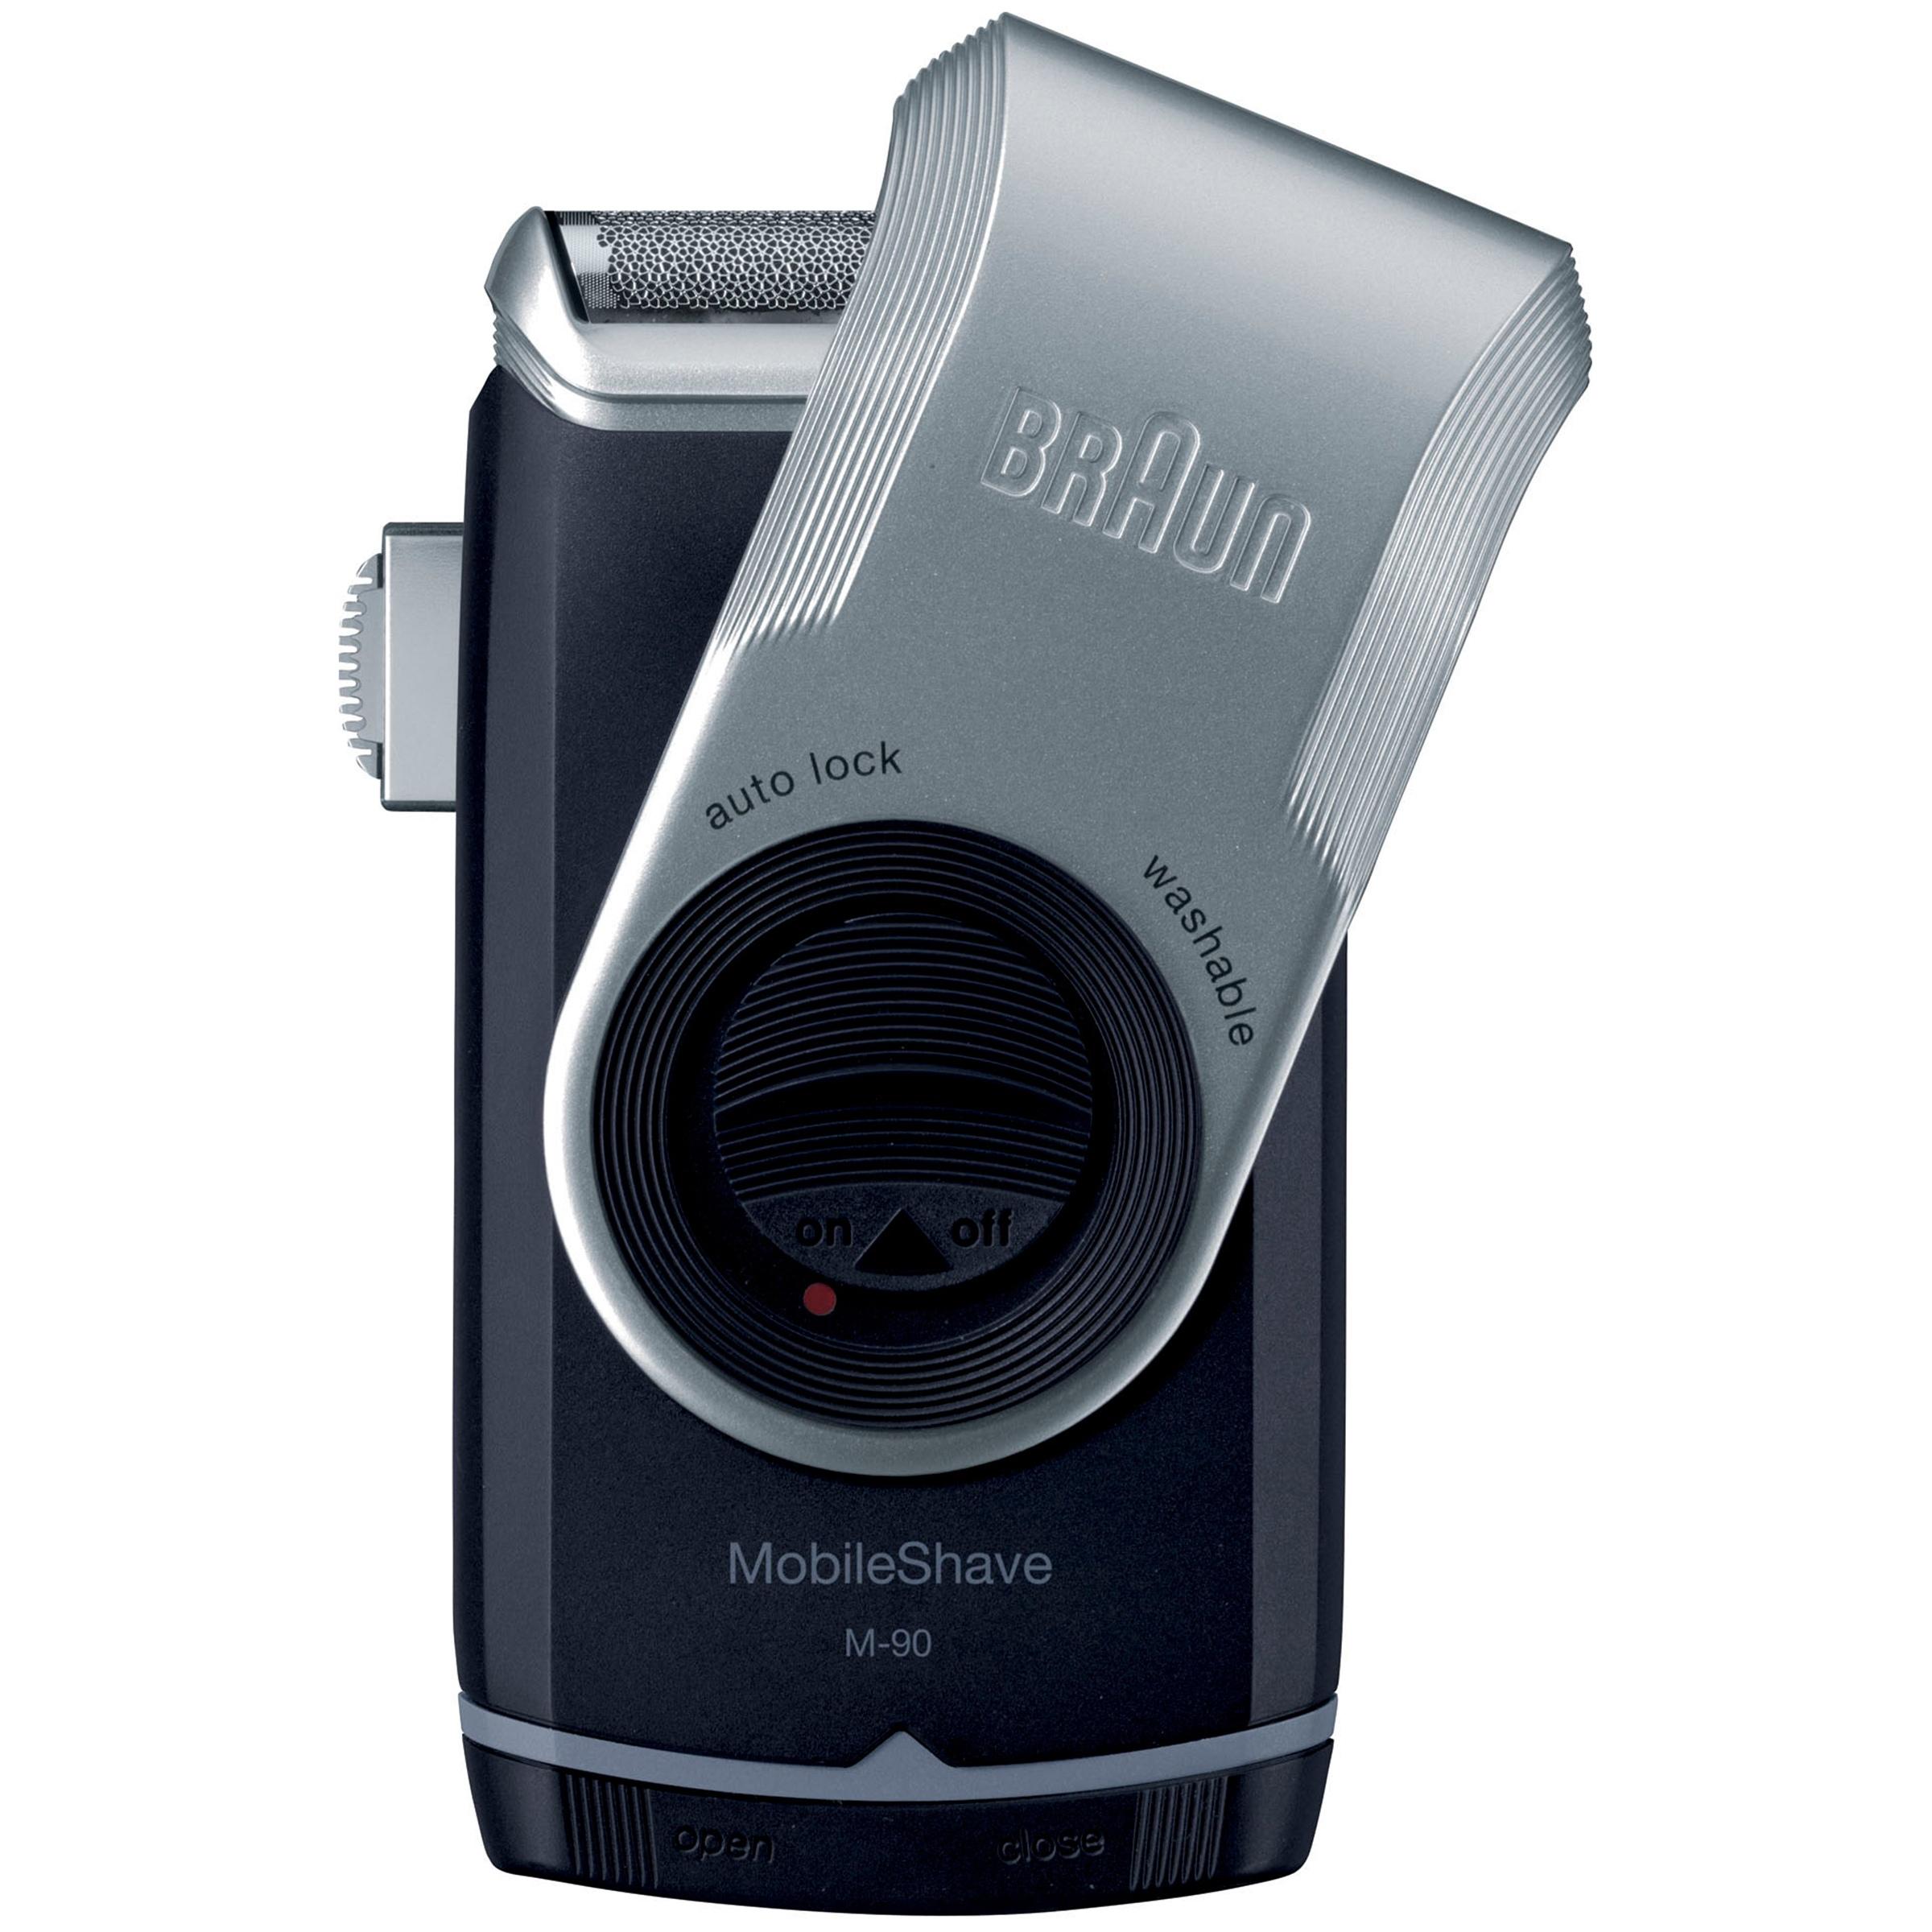 Braun M90 Mobile Shaver, 1 Ct